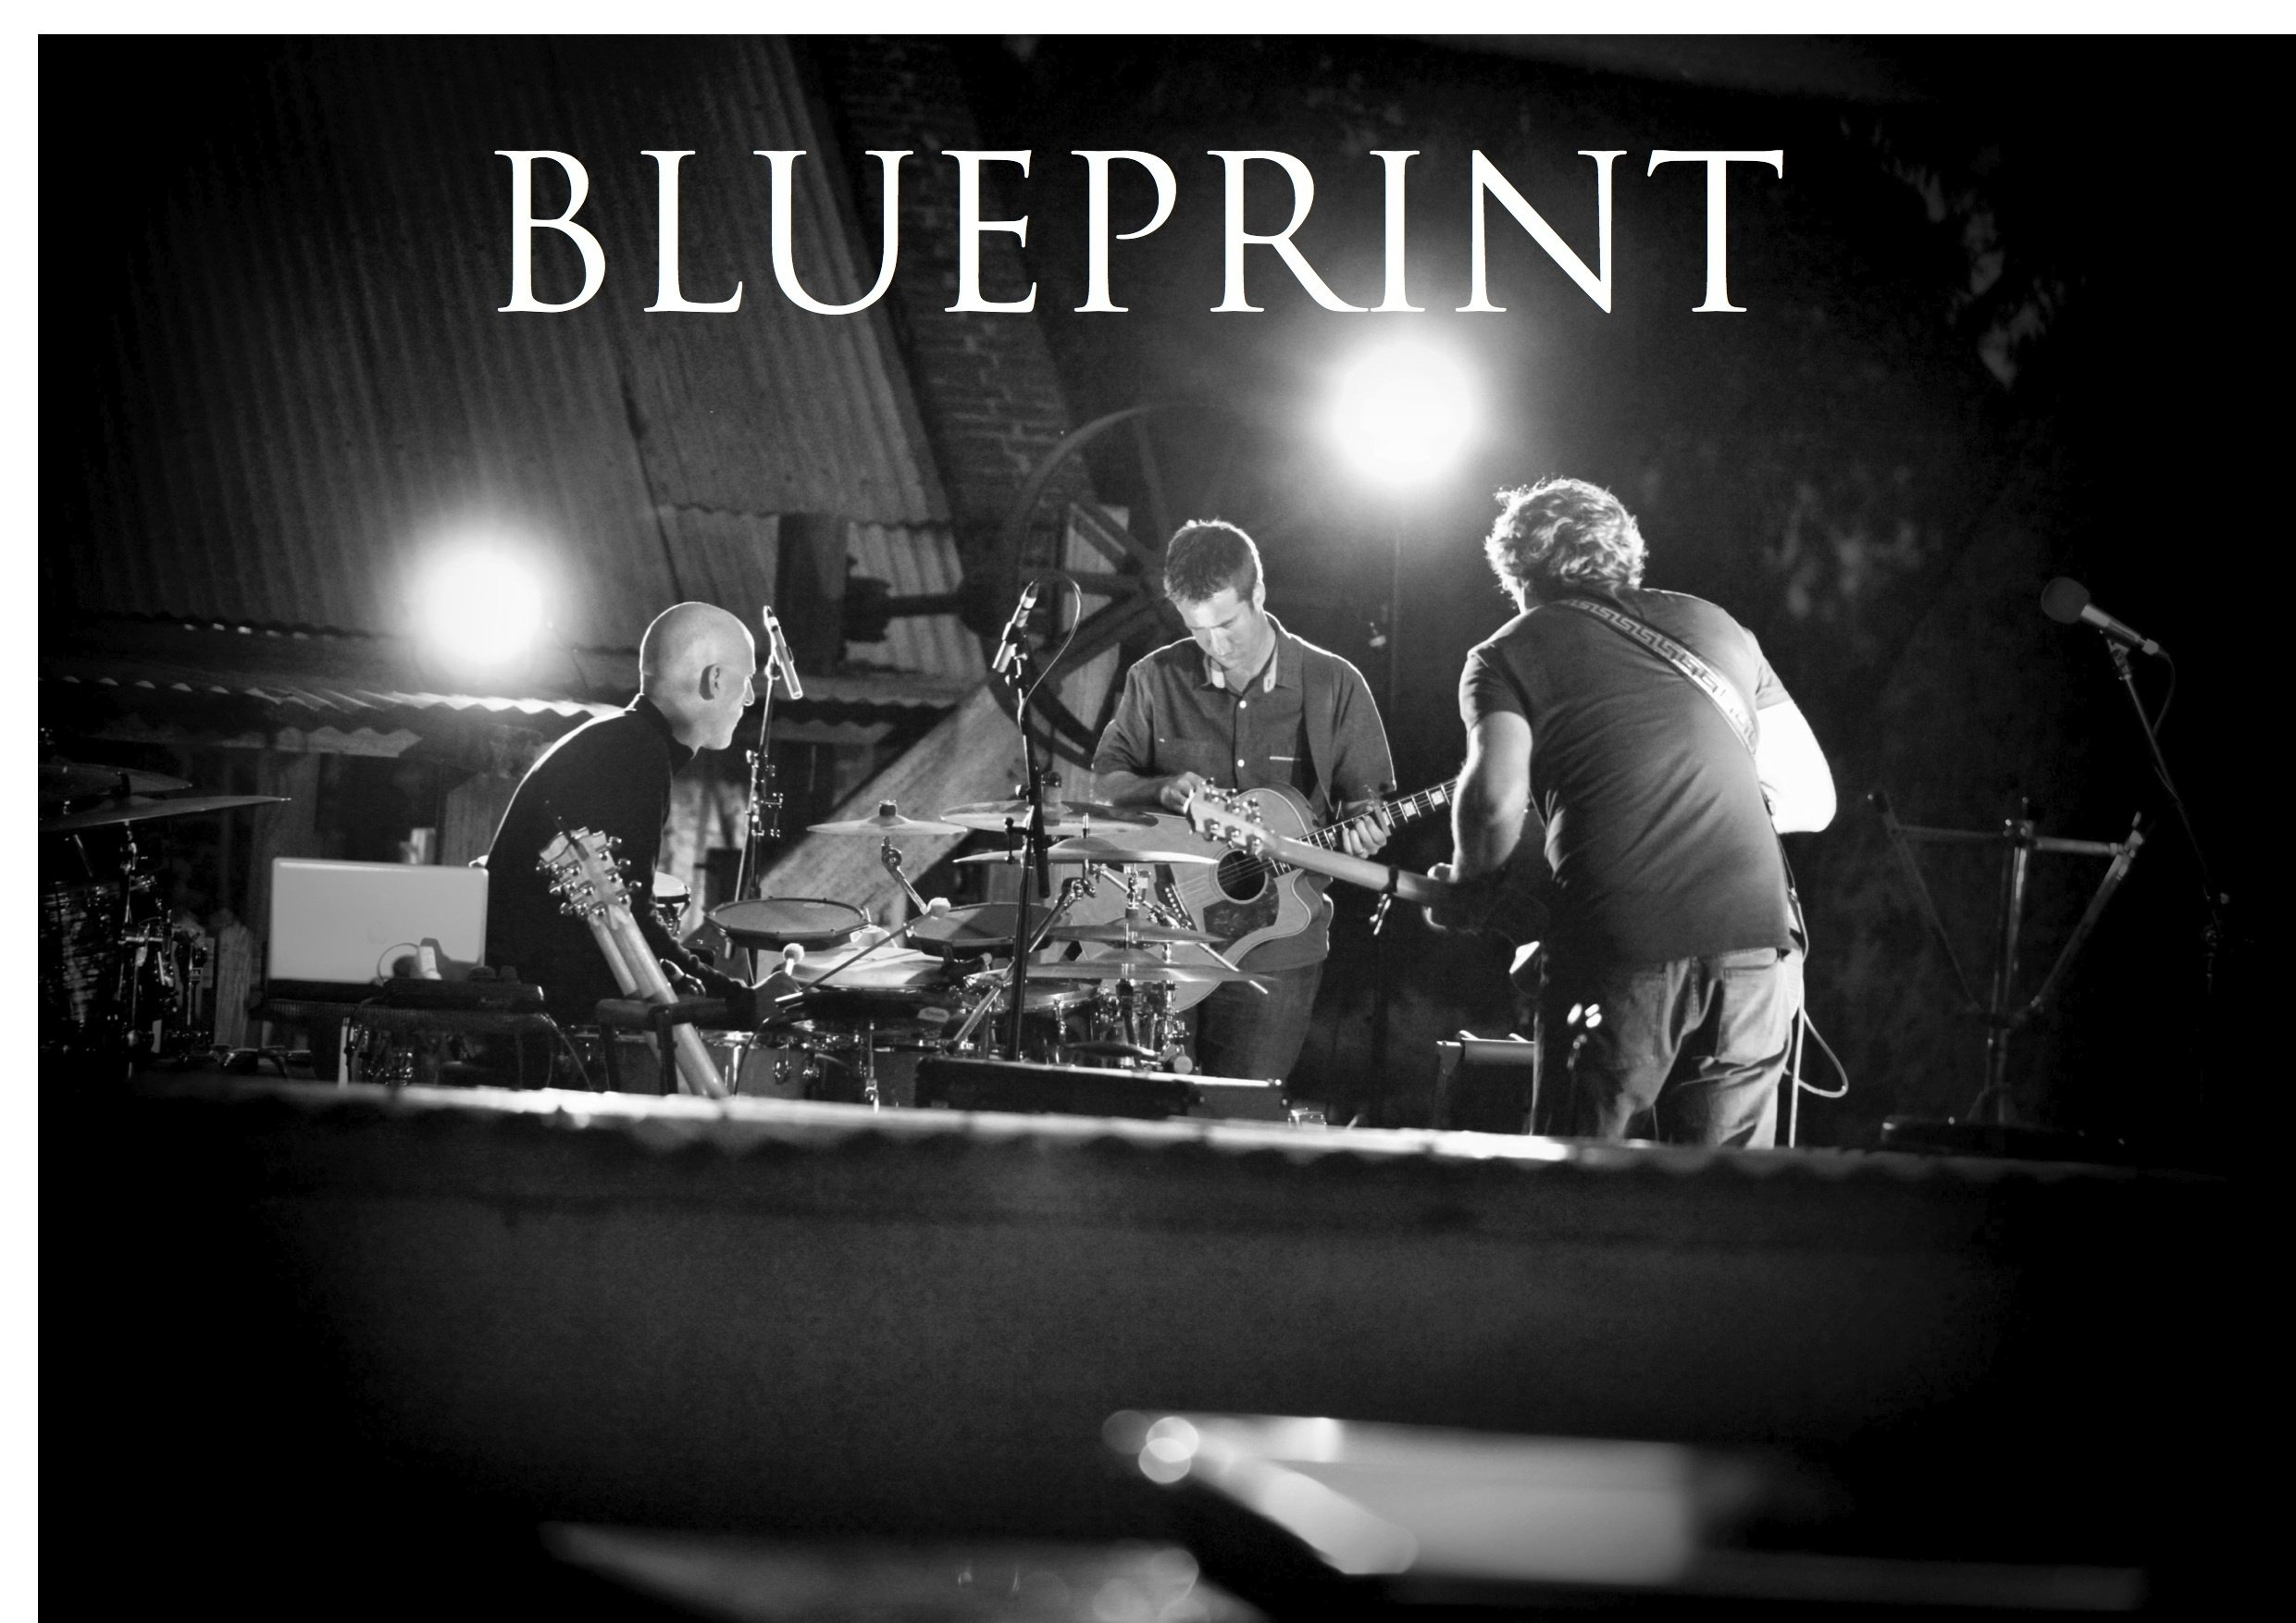 Blueprint reverbnation malvernweather Gallery